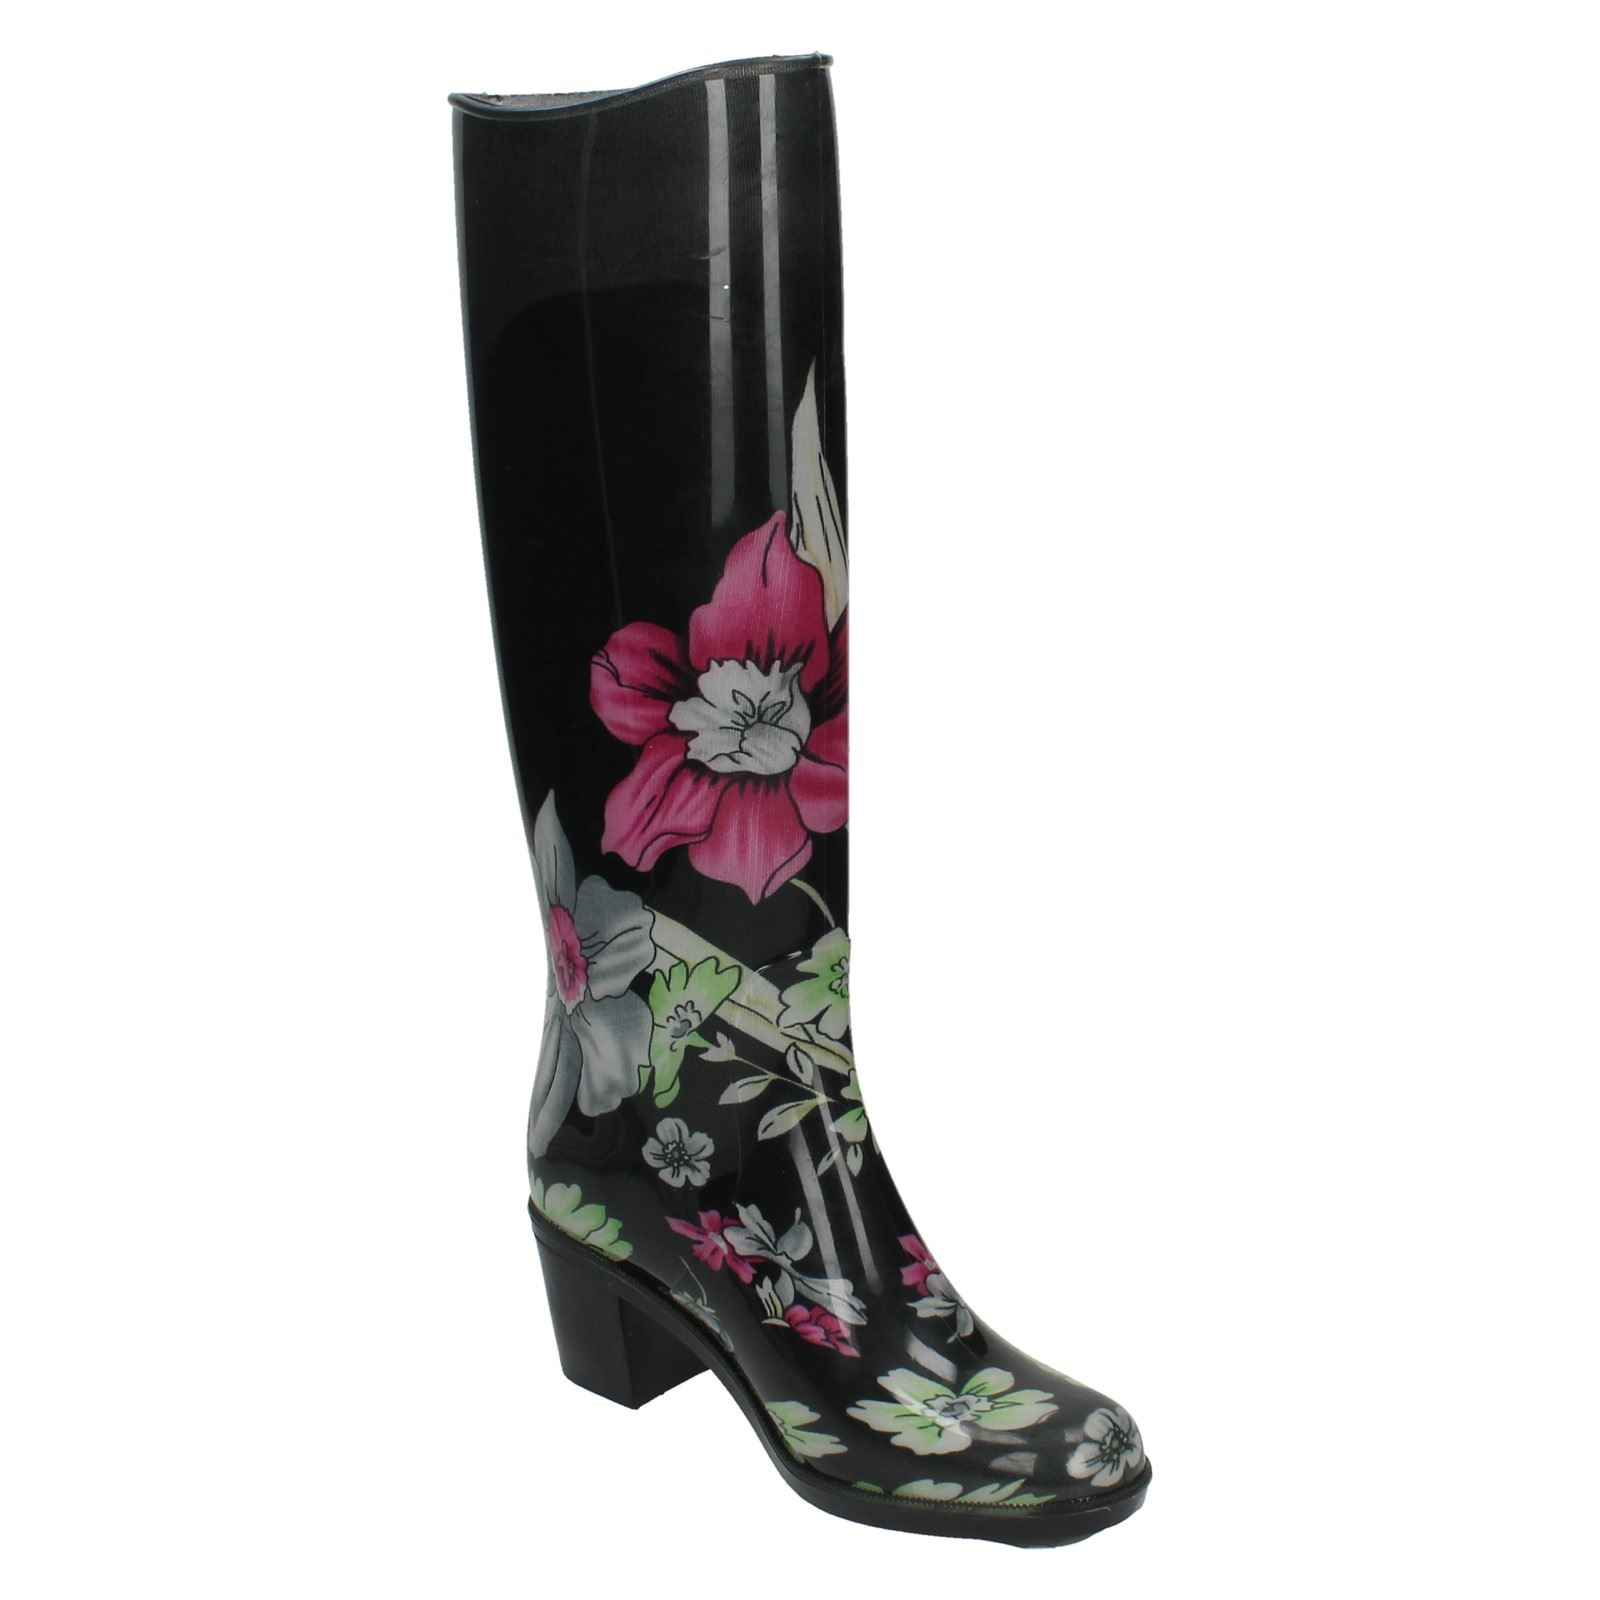 2f8933c279a Mujer Spot On de Tacón Botas de Agua con Floral Diseño